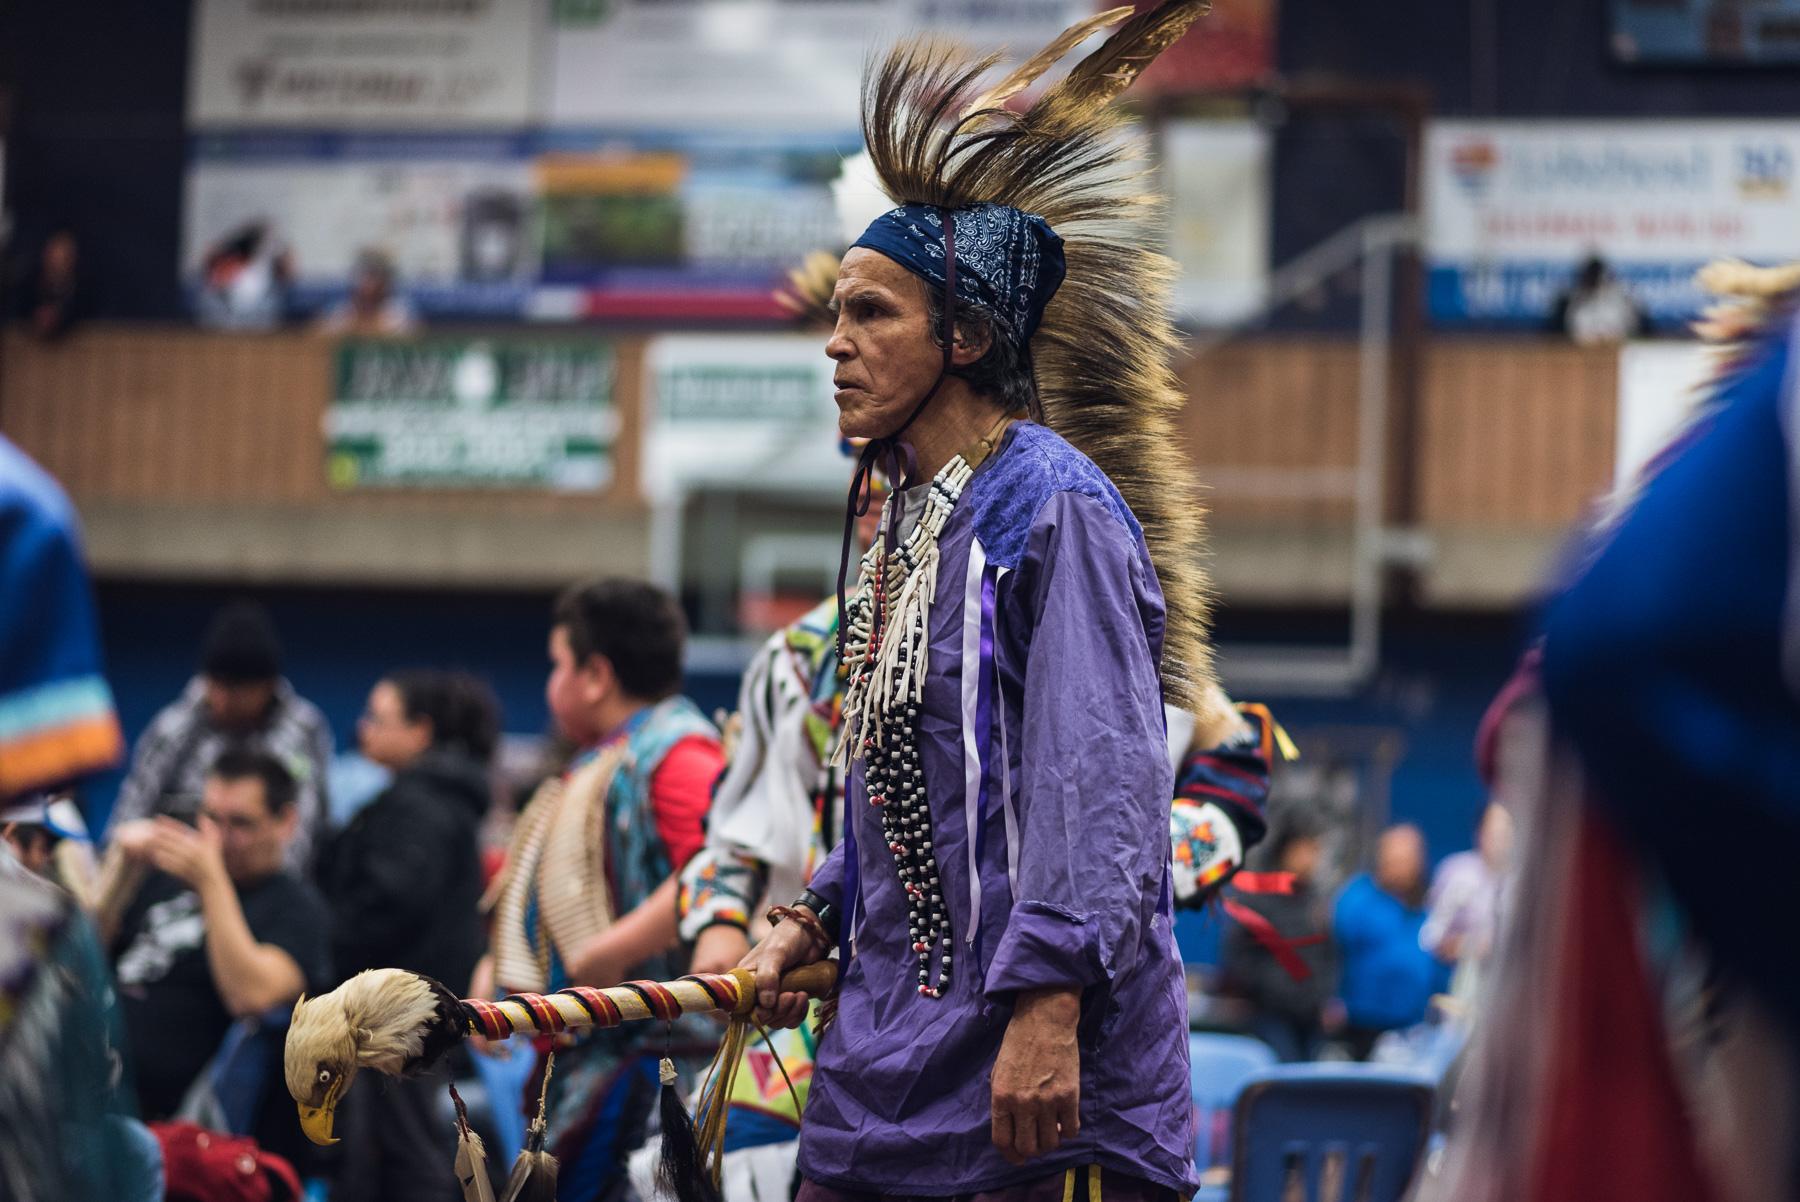 31st-Annual-LUNSA-Powwow-Blog-125.jpg